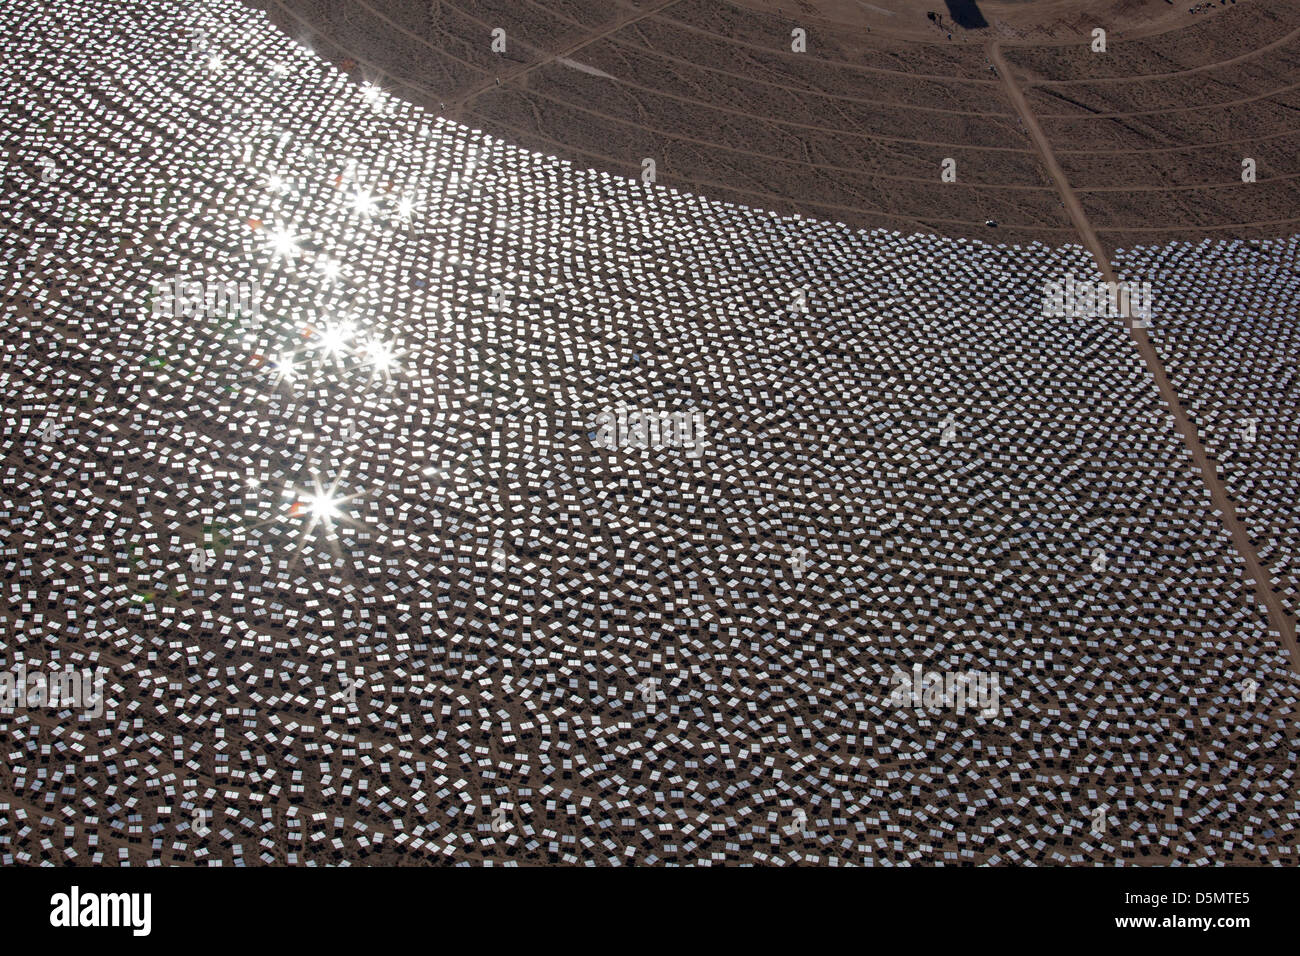 Ivanpah Solar Project Immagini Stock